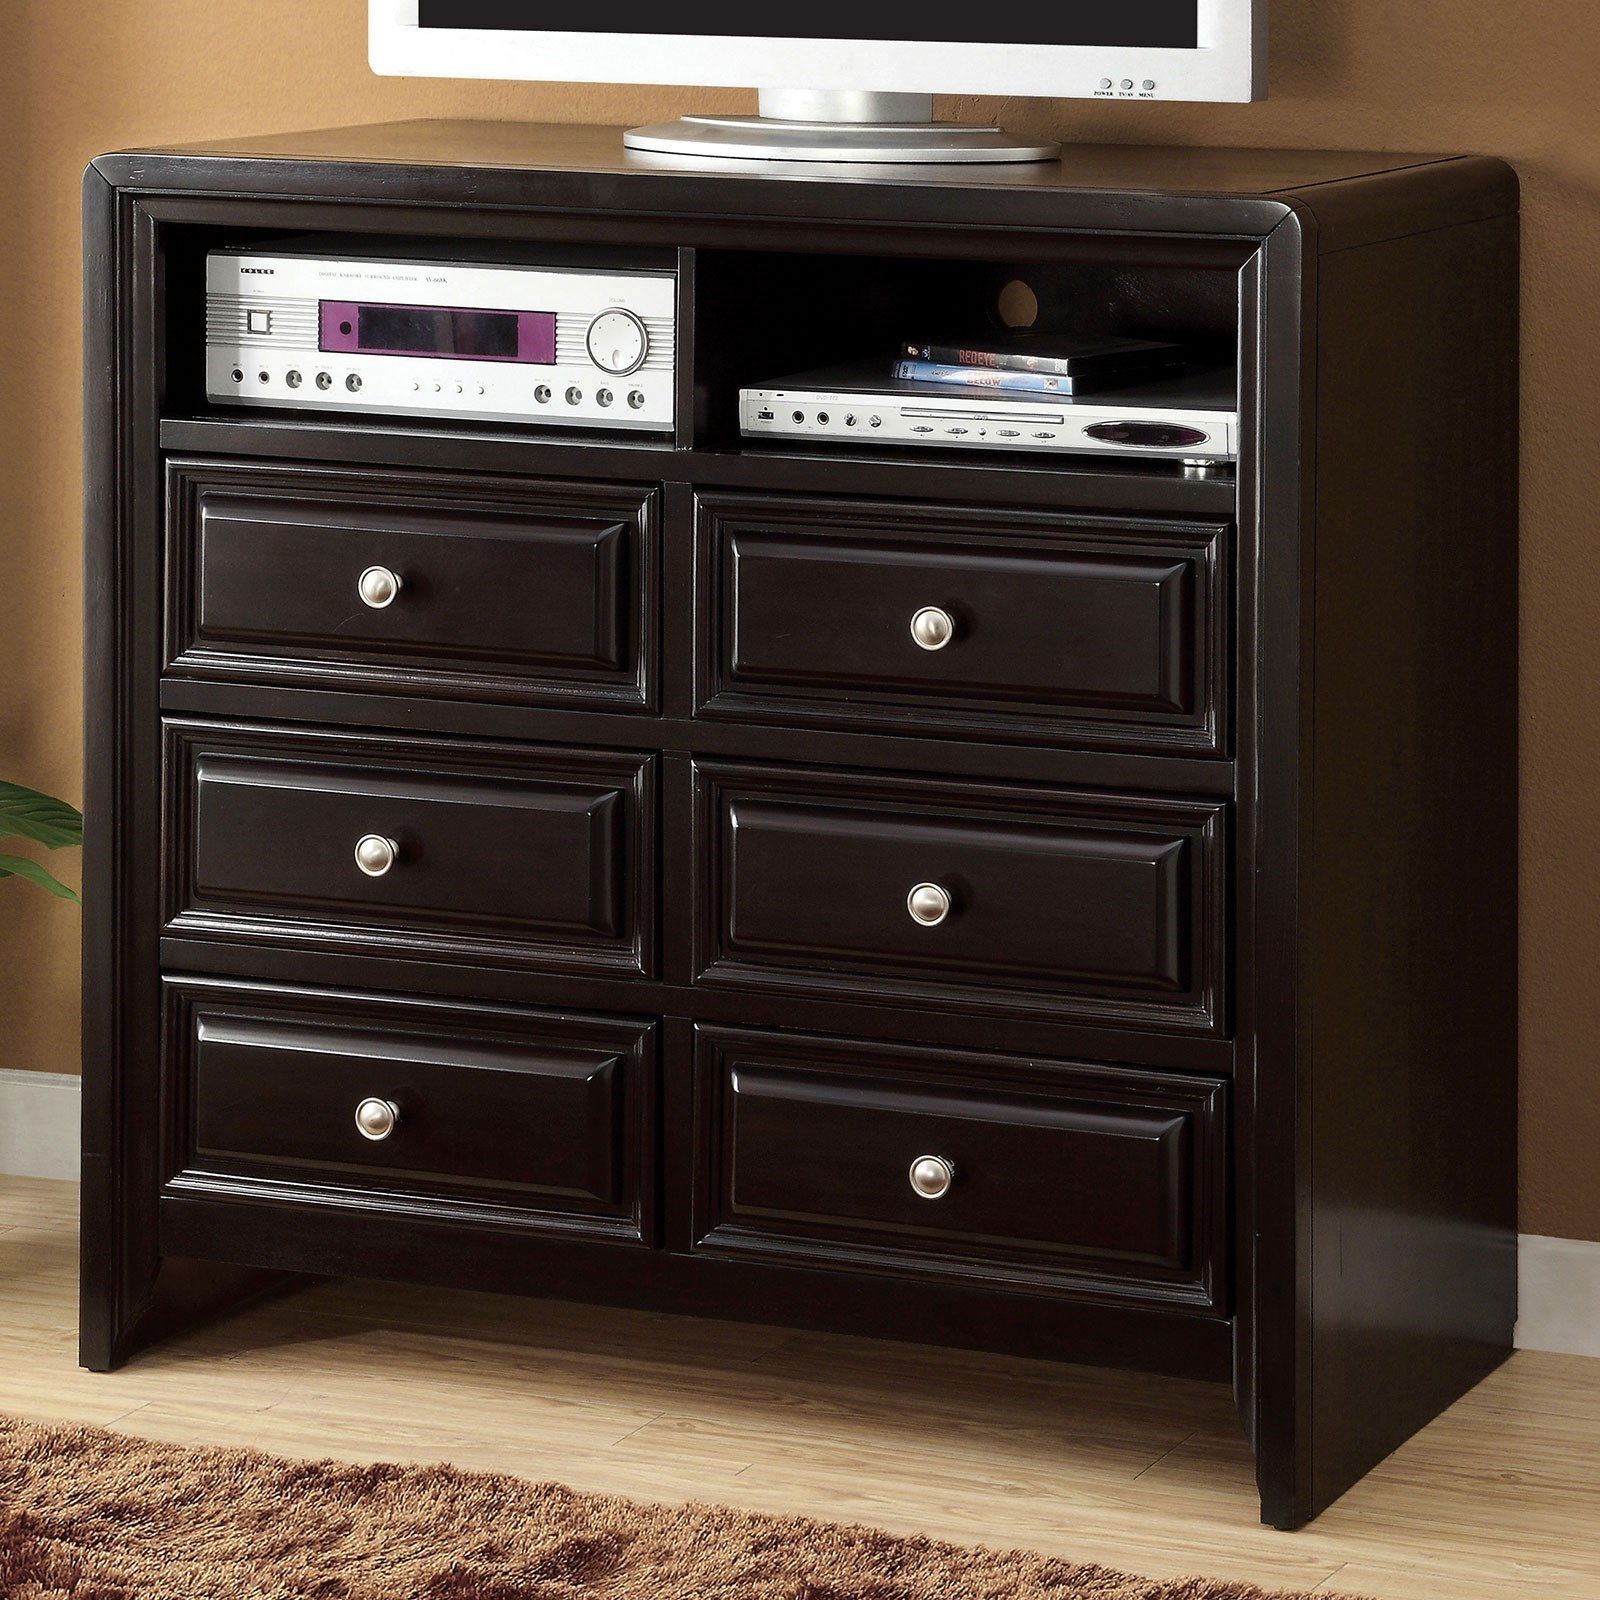 Winsor Media Chest by Furniture of America at Corner Furniture